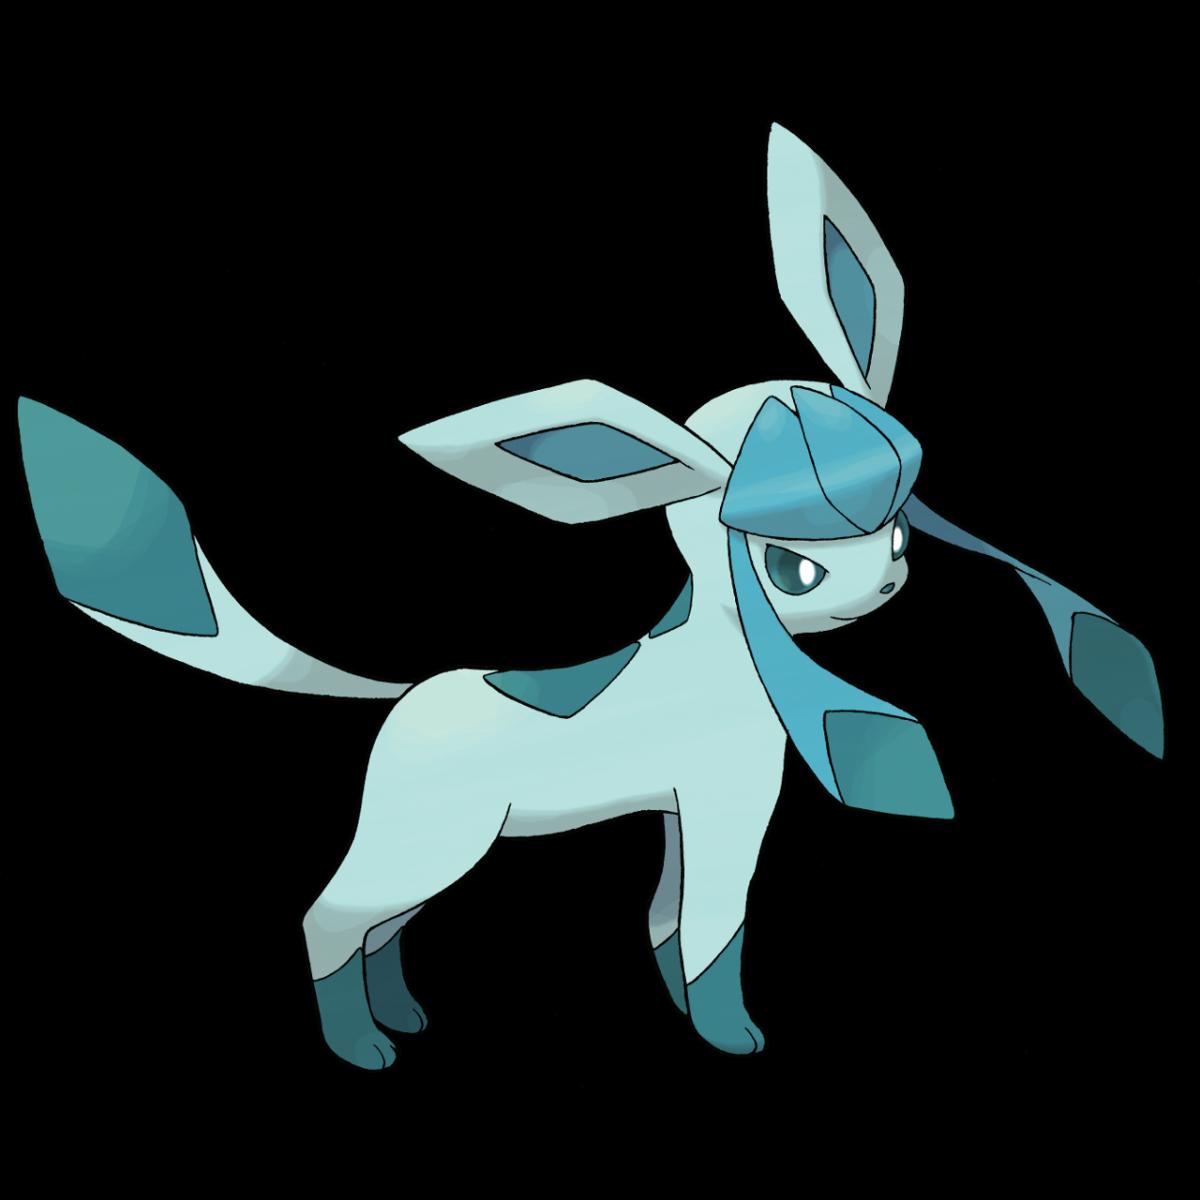 Pokémon X and Y Walkthrough, Pokémon Move Sets: Glaceon